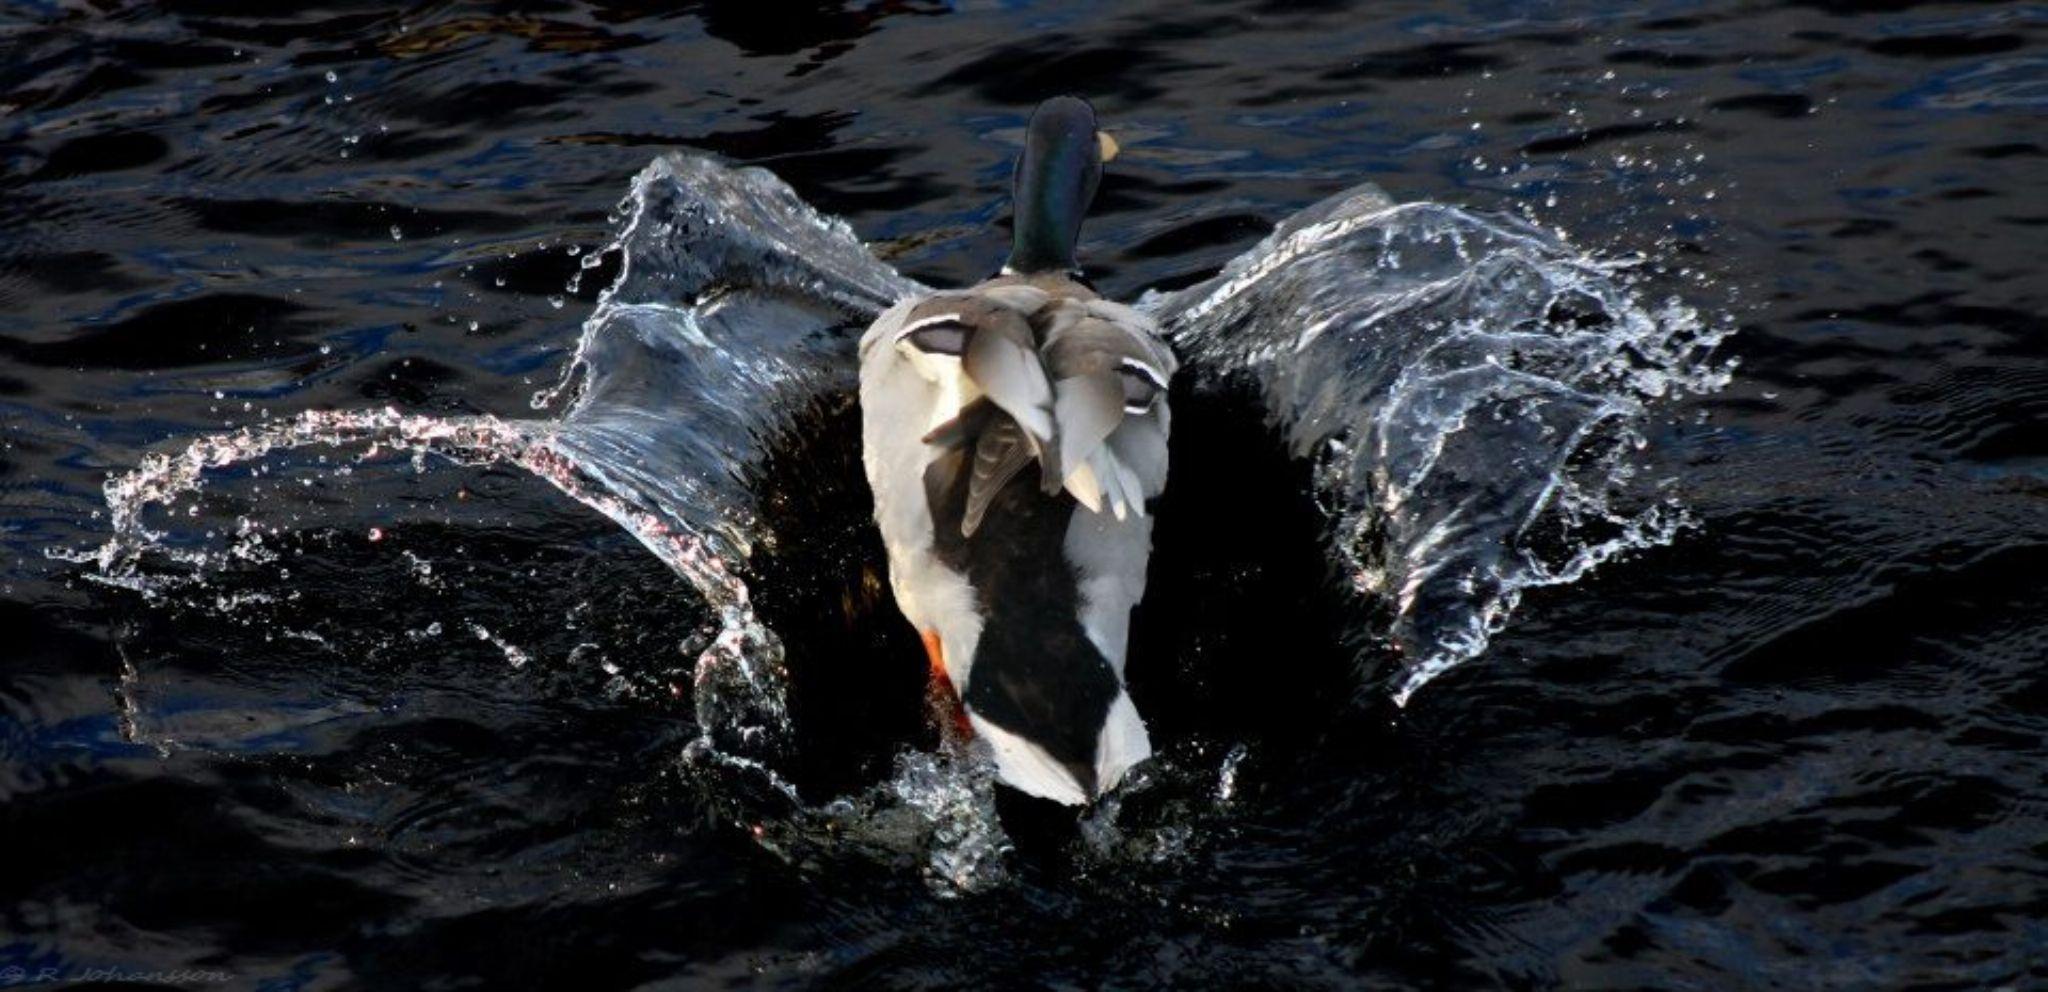 Splash by roger.joh